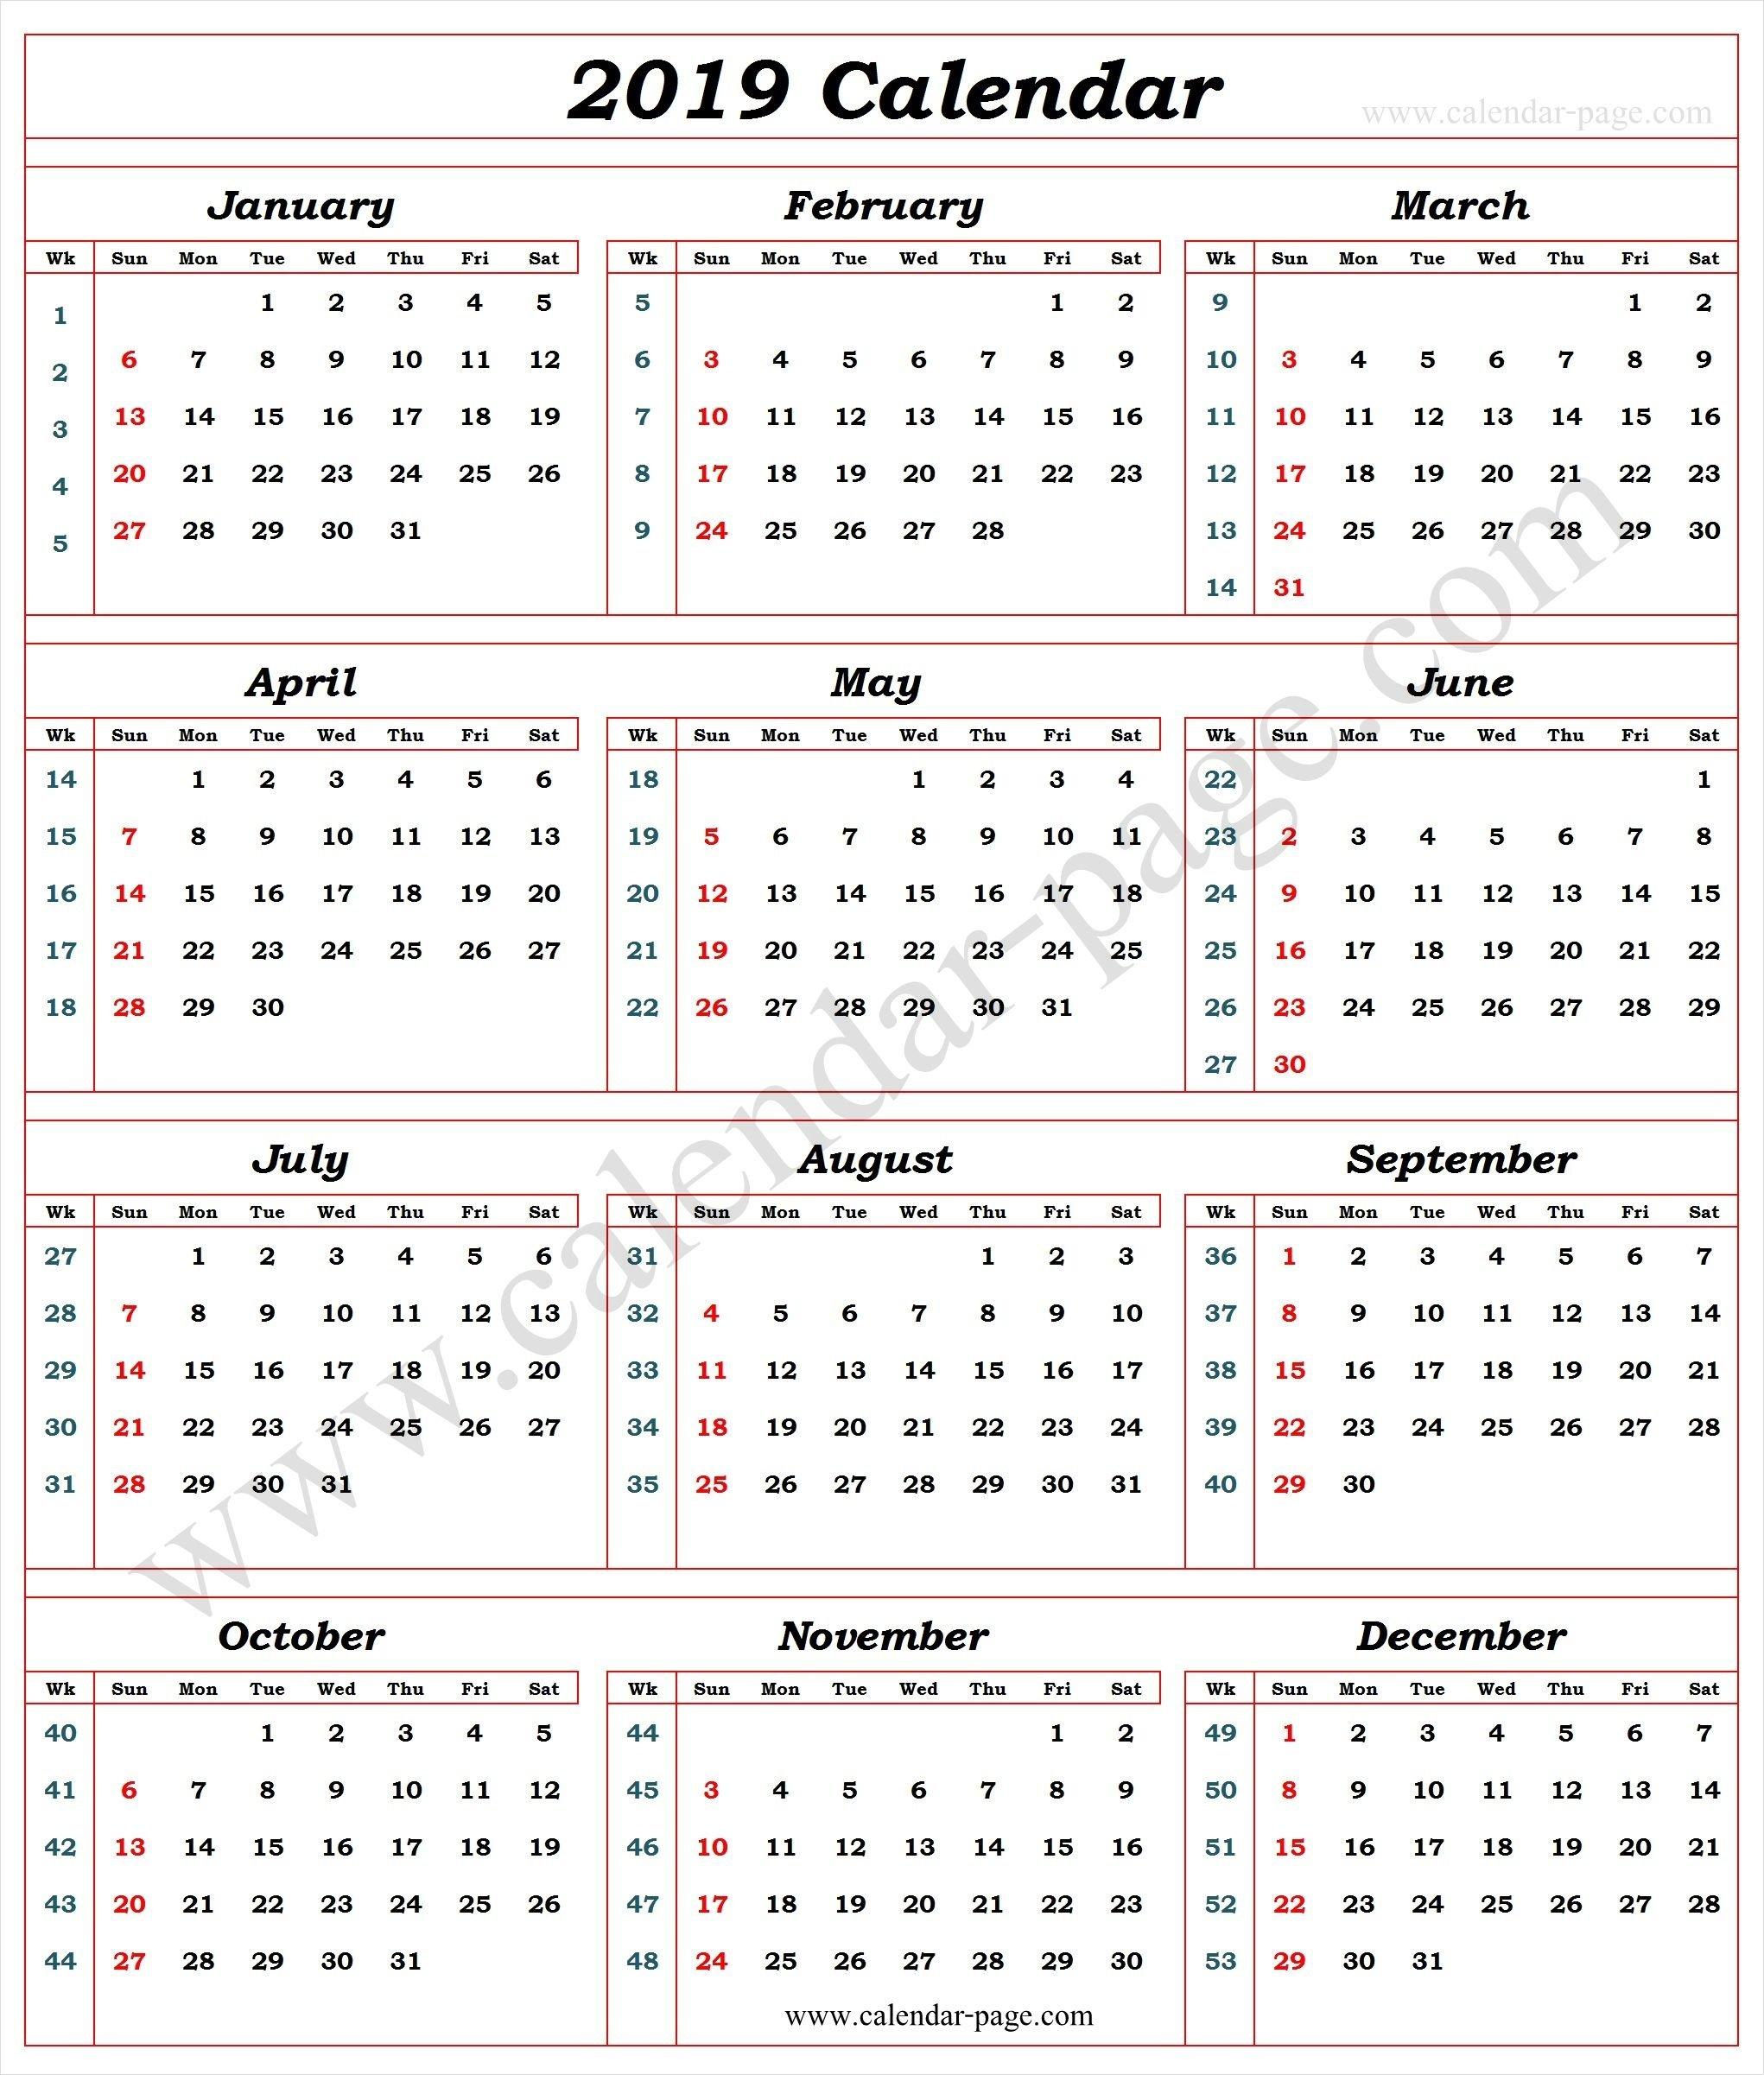 Calendar 2019 With Week Numbers | 2019 Calendar Template | Calendar Calendar Week 11 2019